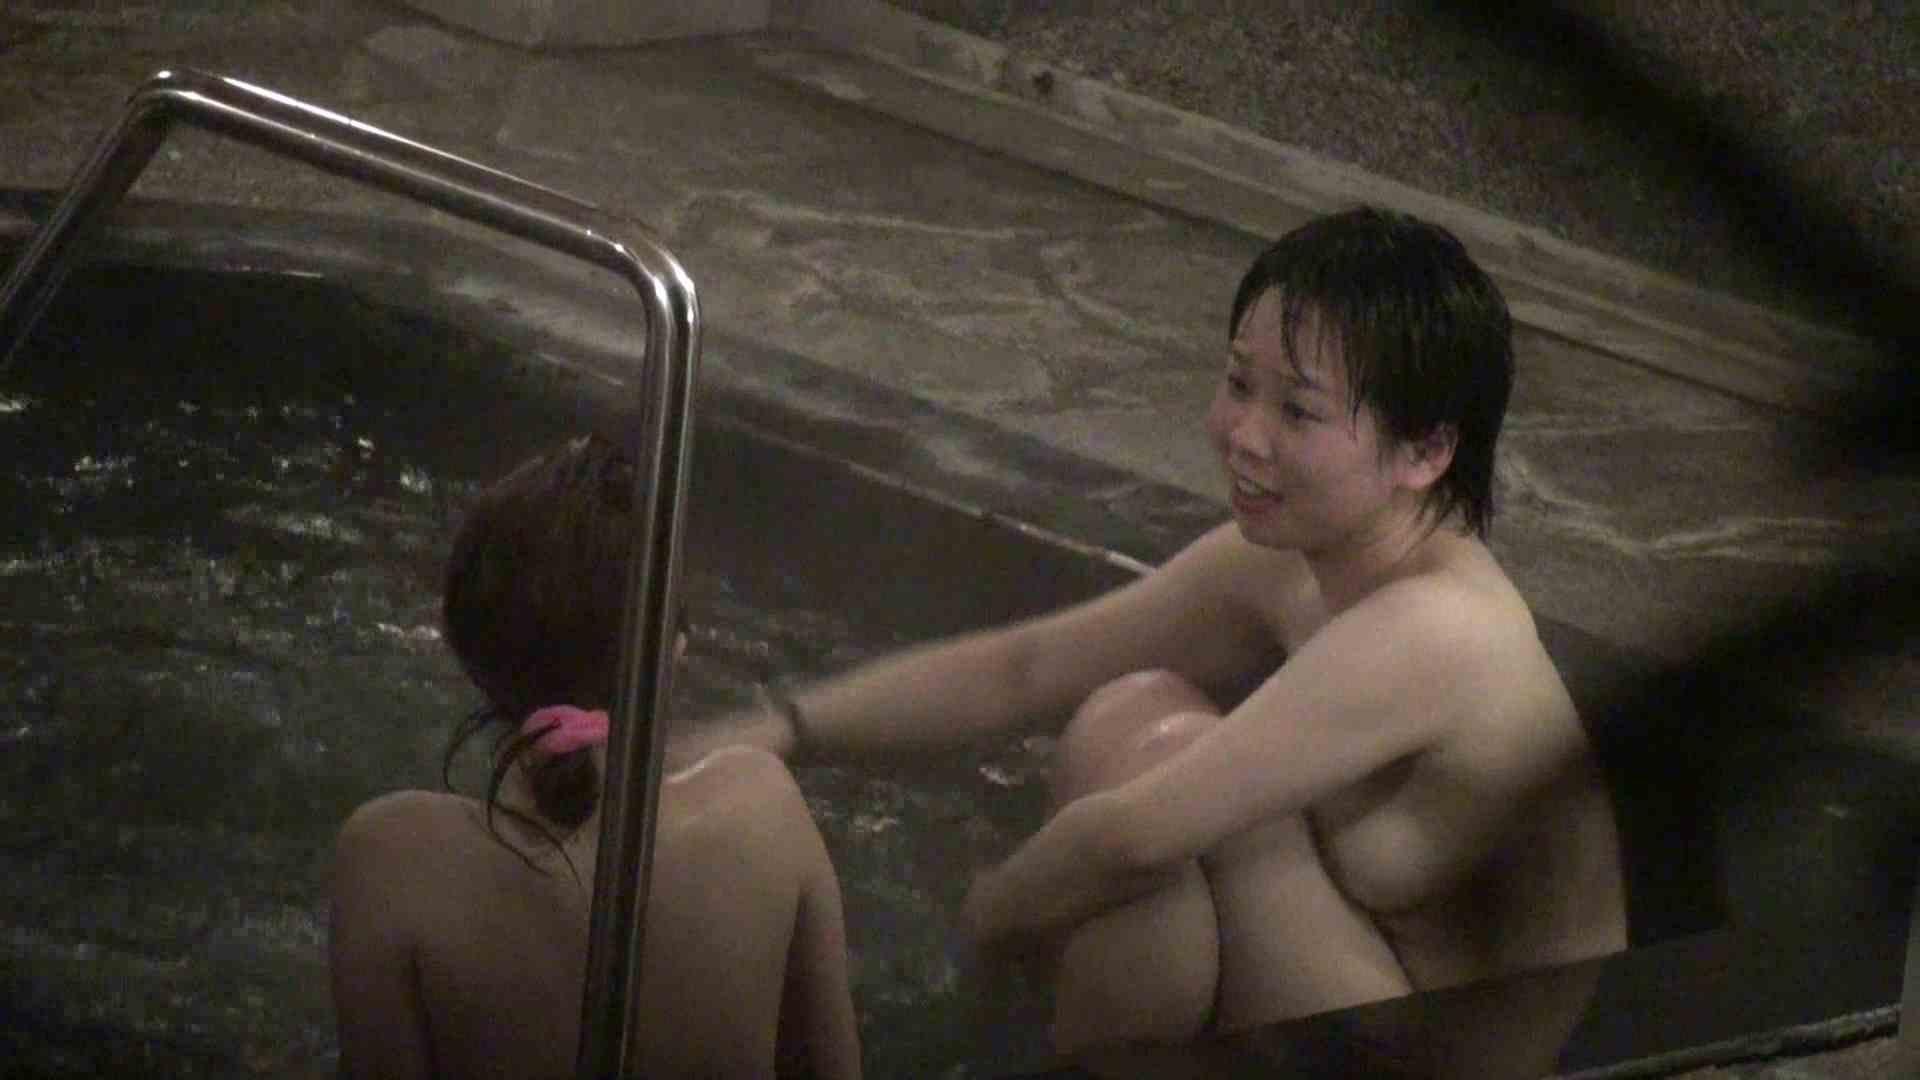 Aquaな露天風呂Vol.394 盗撮師作品  70pic 6